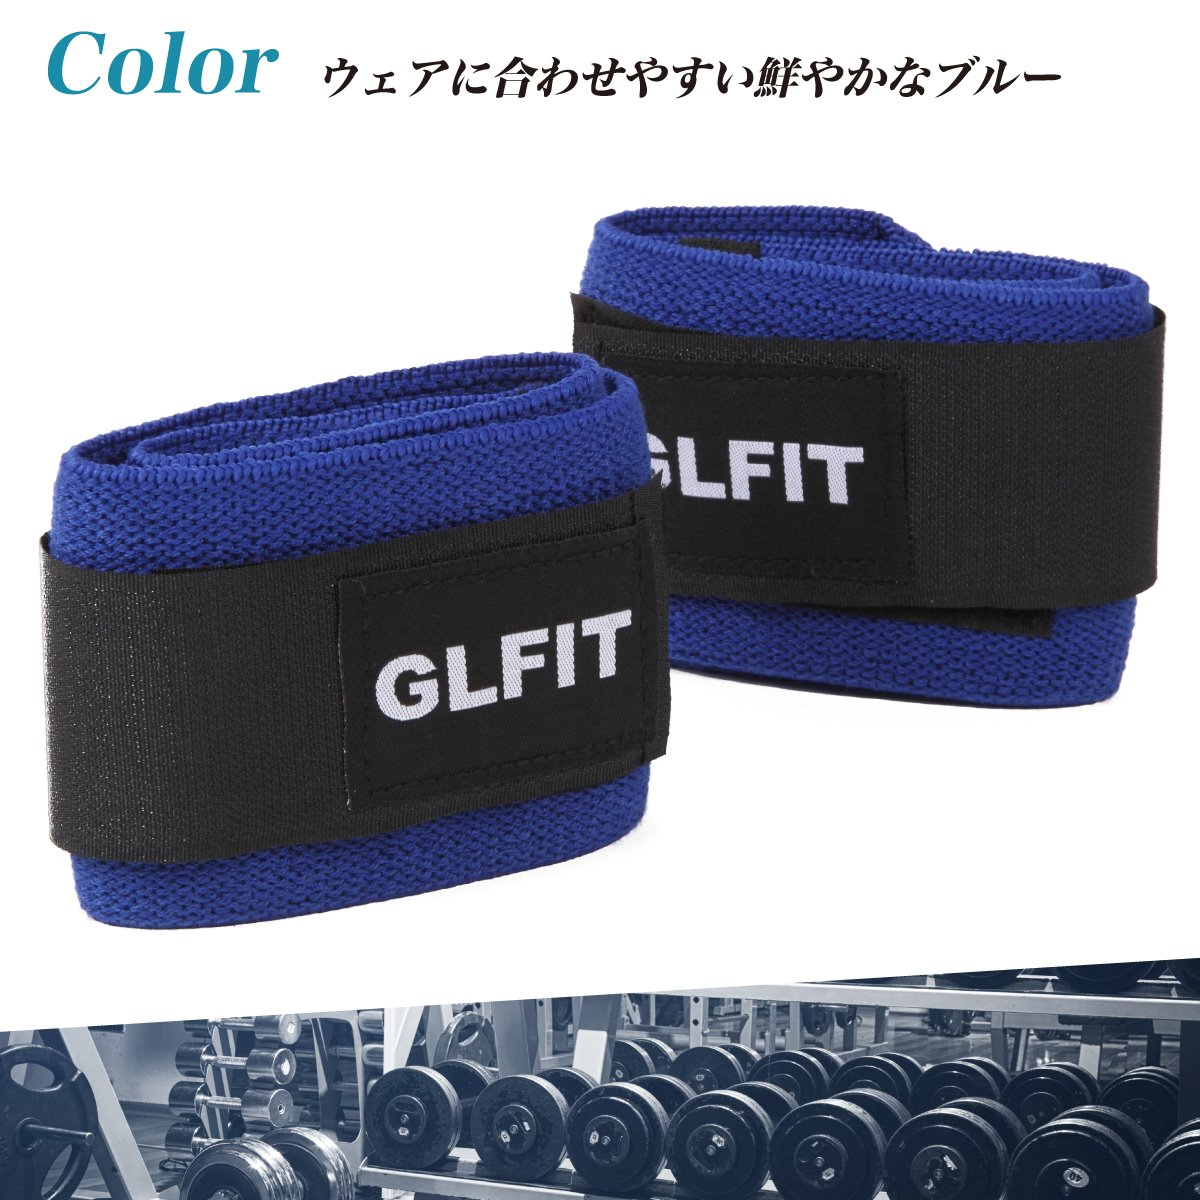 GLFIT マルチラップ 65cm 送料無料